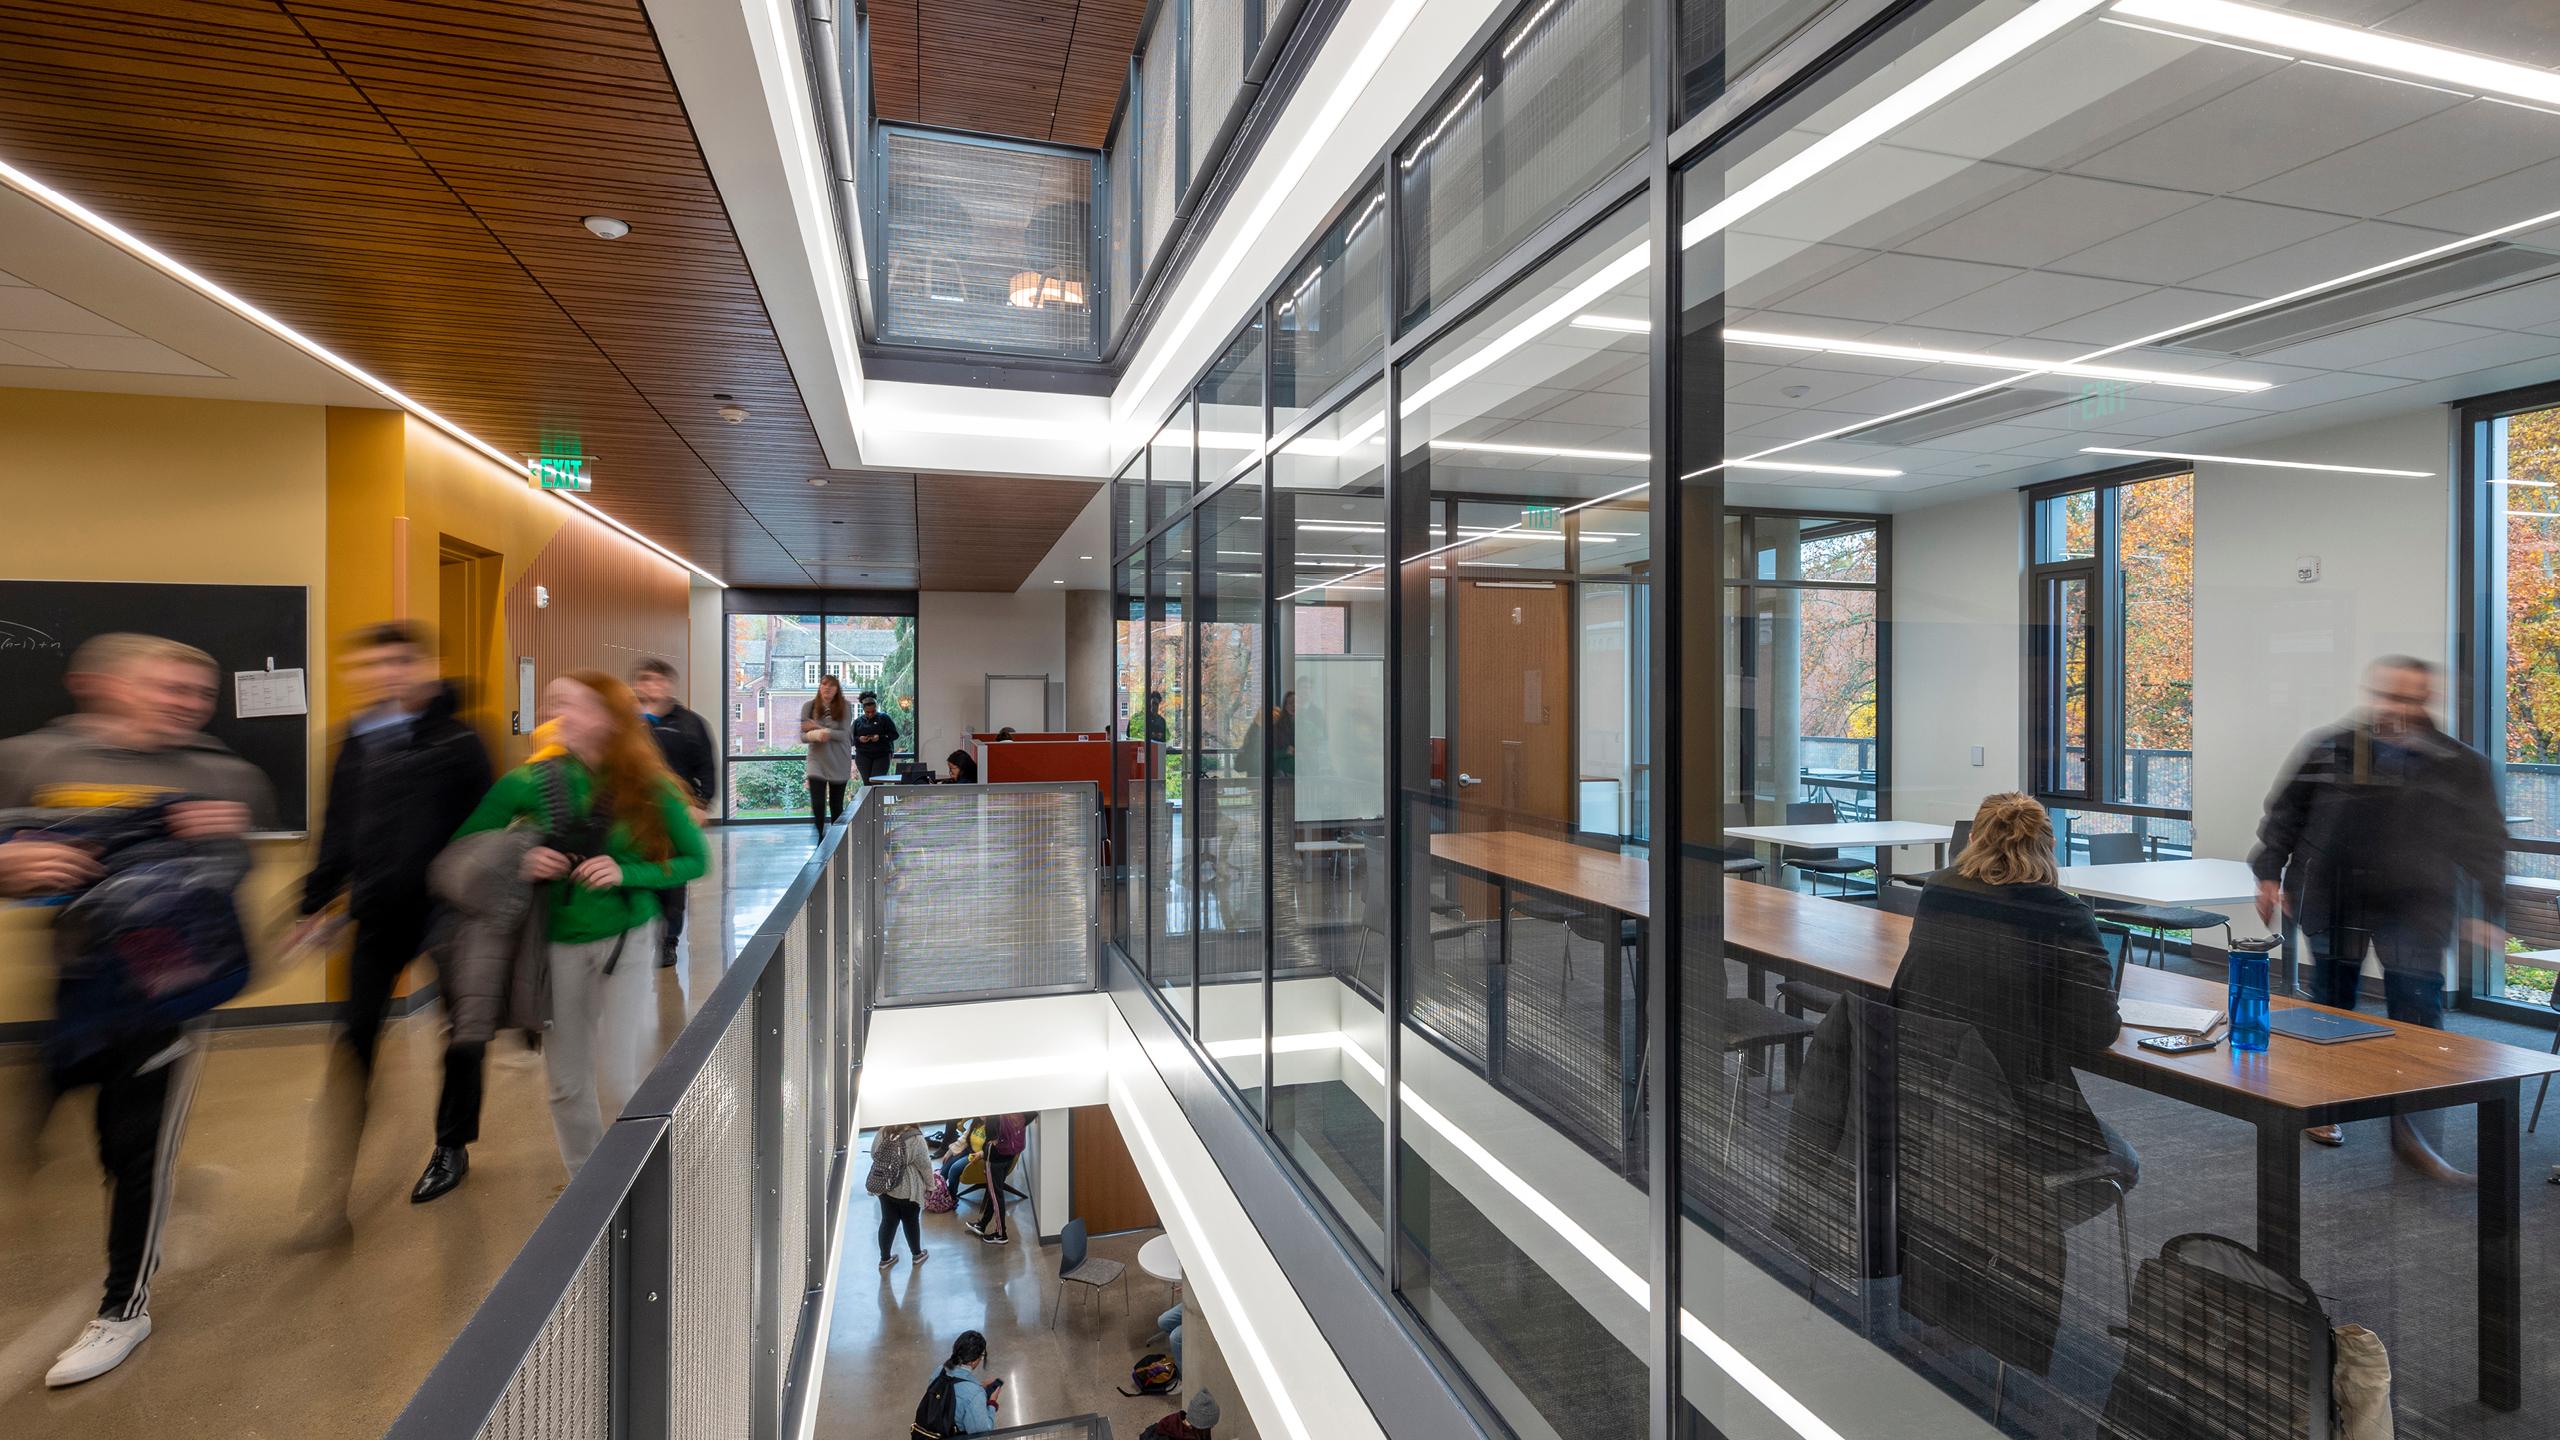 Tykeson Hall at the University of Oregon / image 16